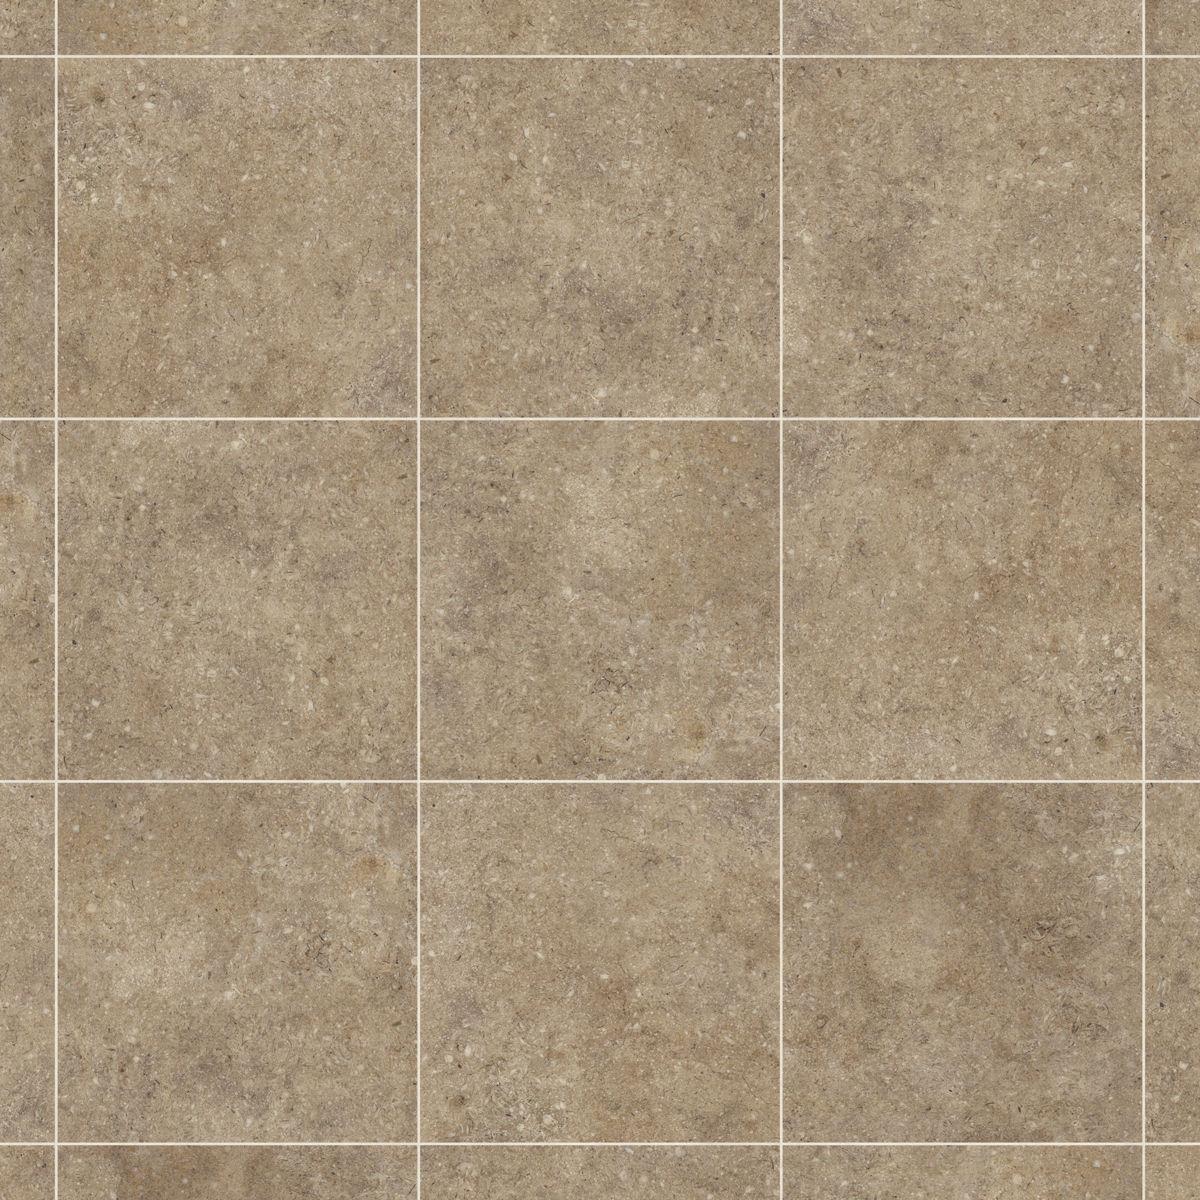 Karndean da vinci santi limestone lst05 vinyl flooring for Vinyl floor tiles